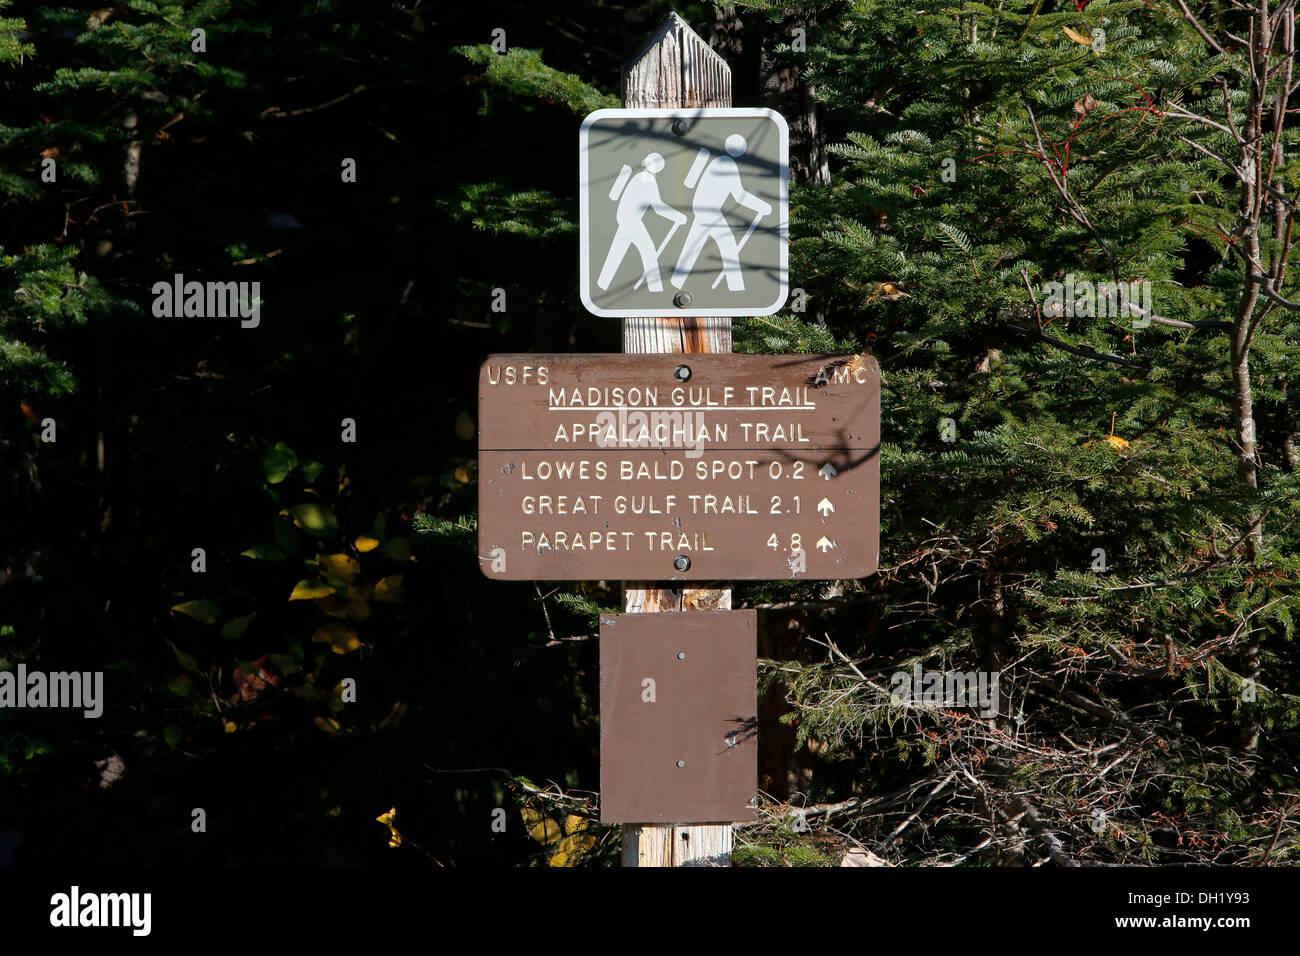 Hiking trails of the Appalachian Trail on Mount Washington, New Hampshire, USA - Stock Image